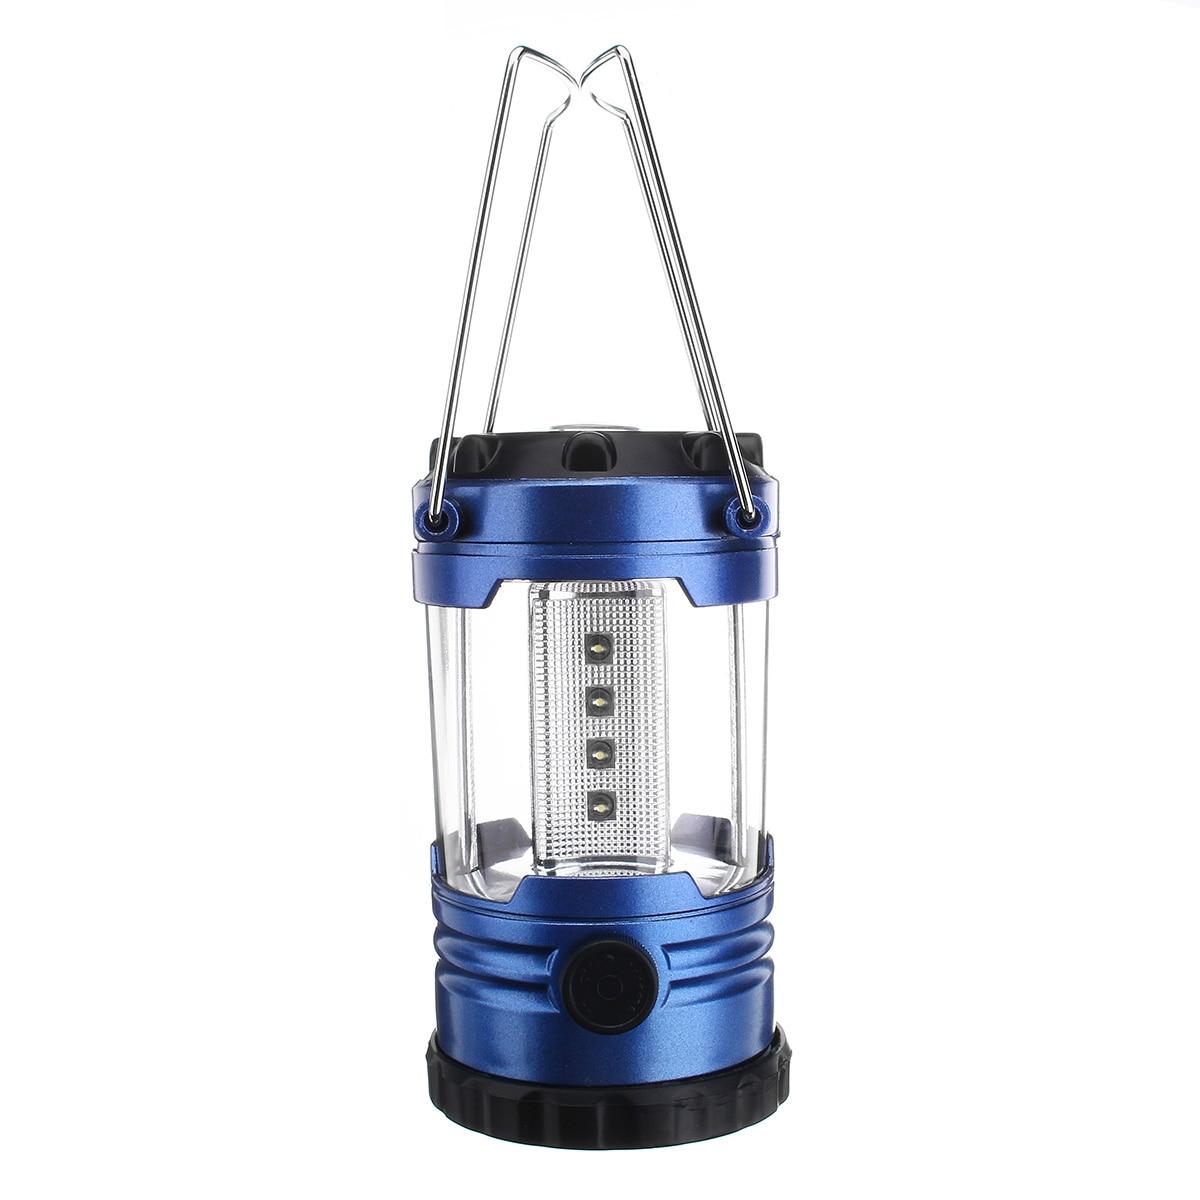 Camping Lights LED Flashlight Outdoor Portable Lantern Mini Tent Light Emergency Lamp AA